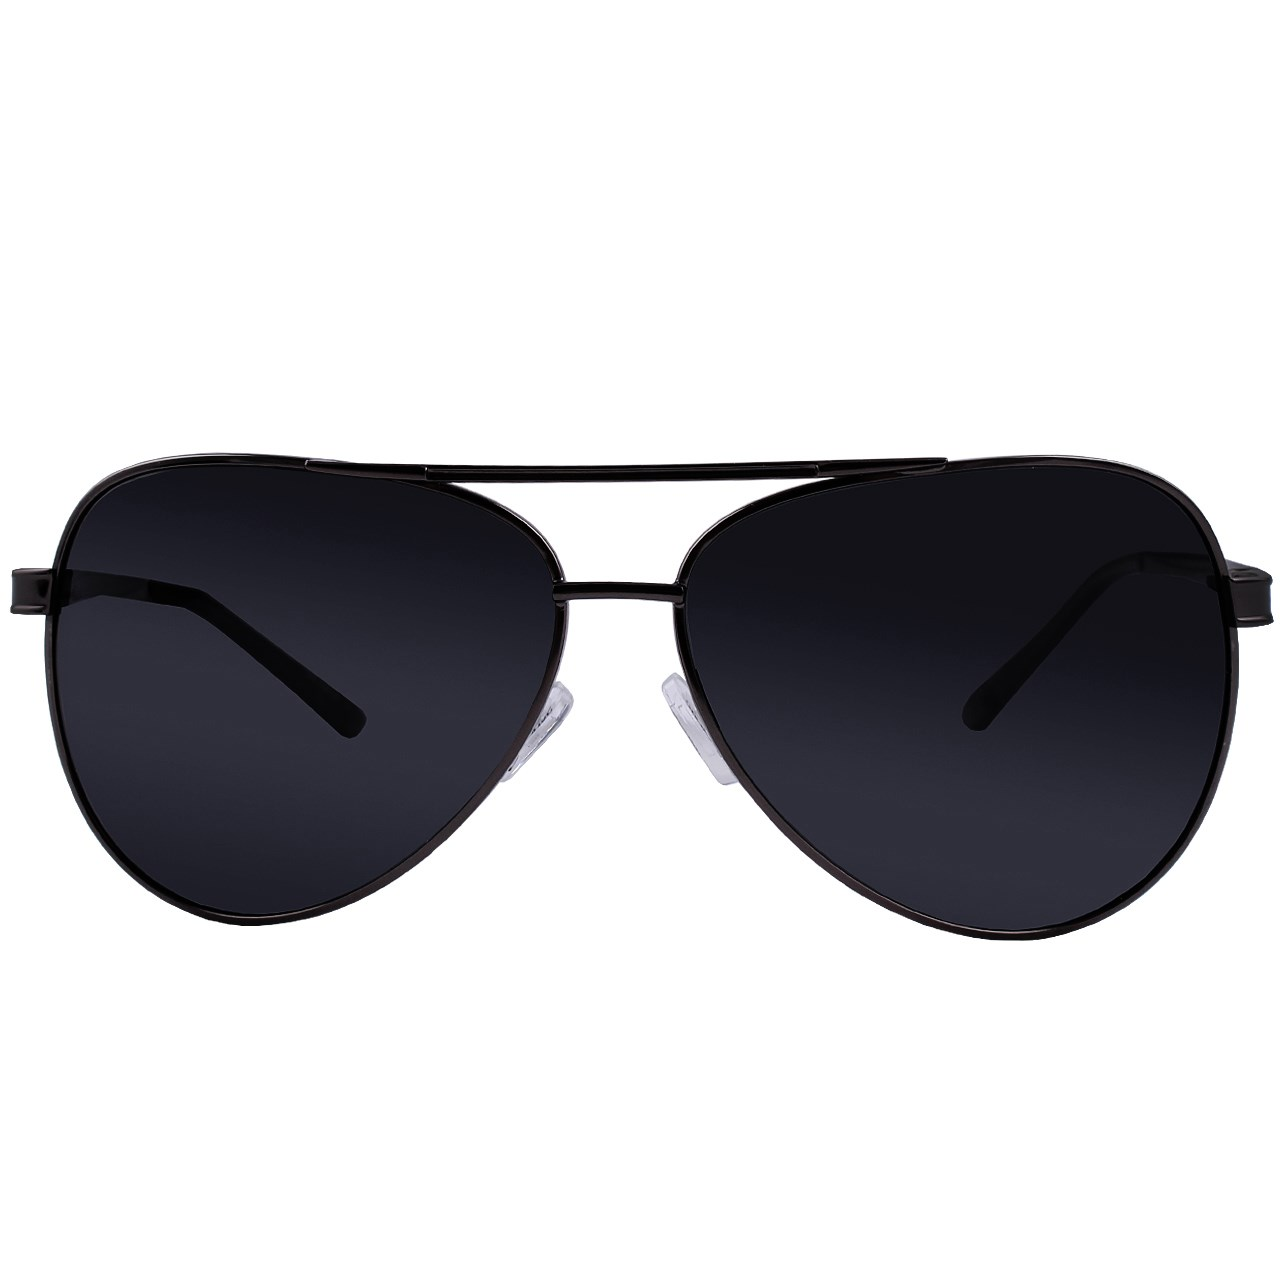 عینک آفتابی واته مدل BL 9918